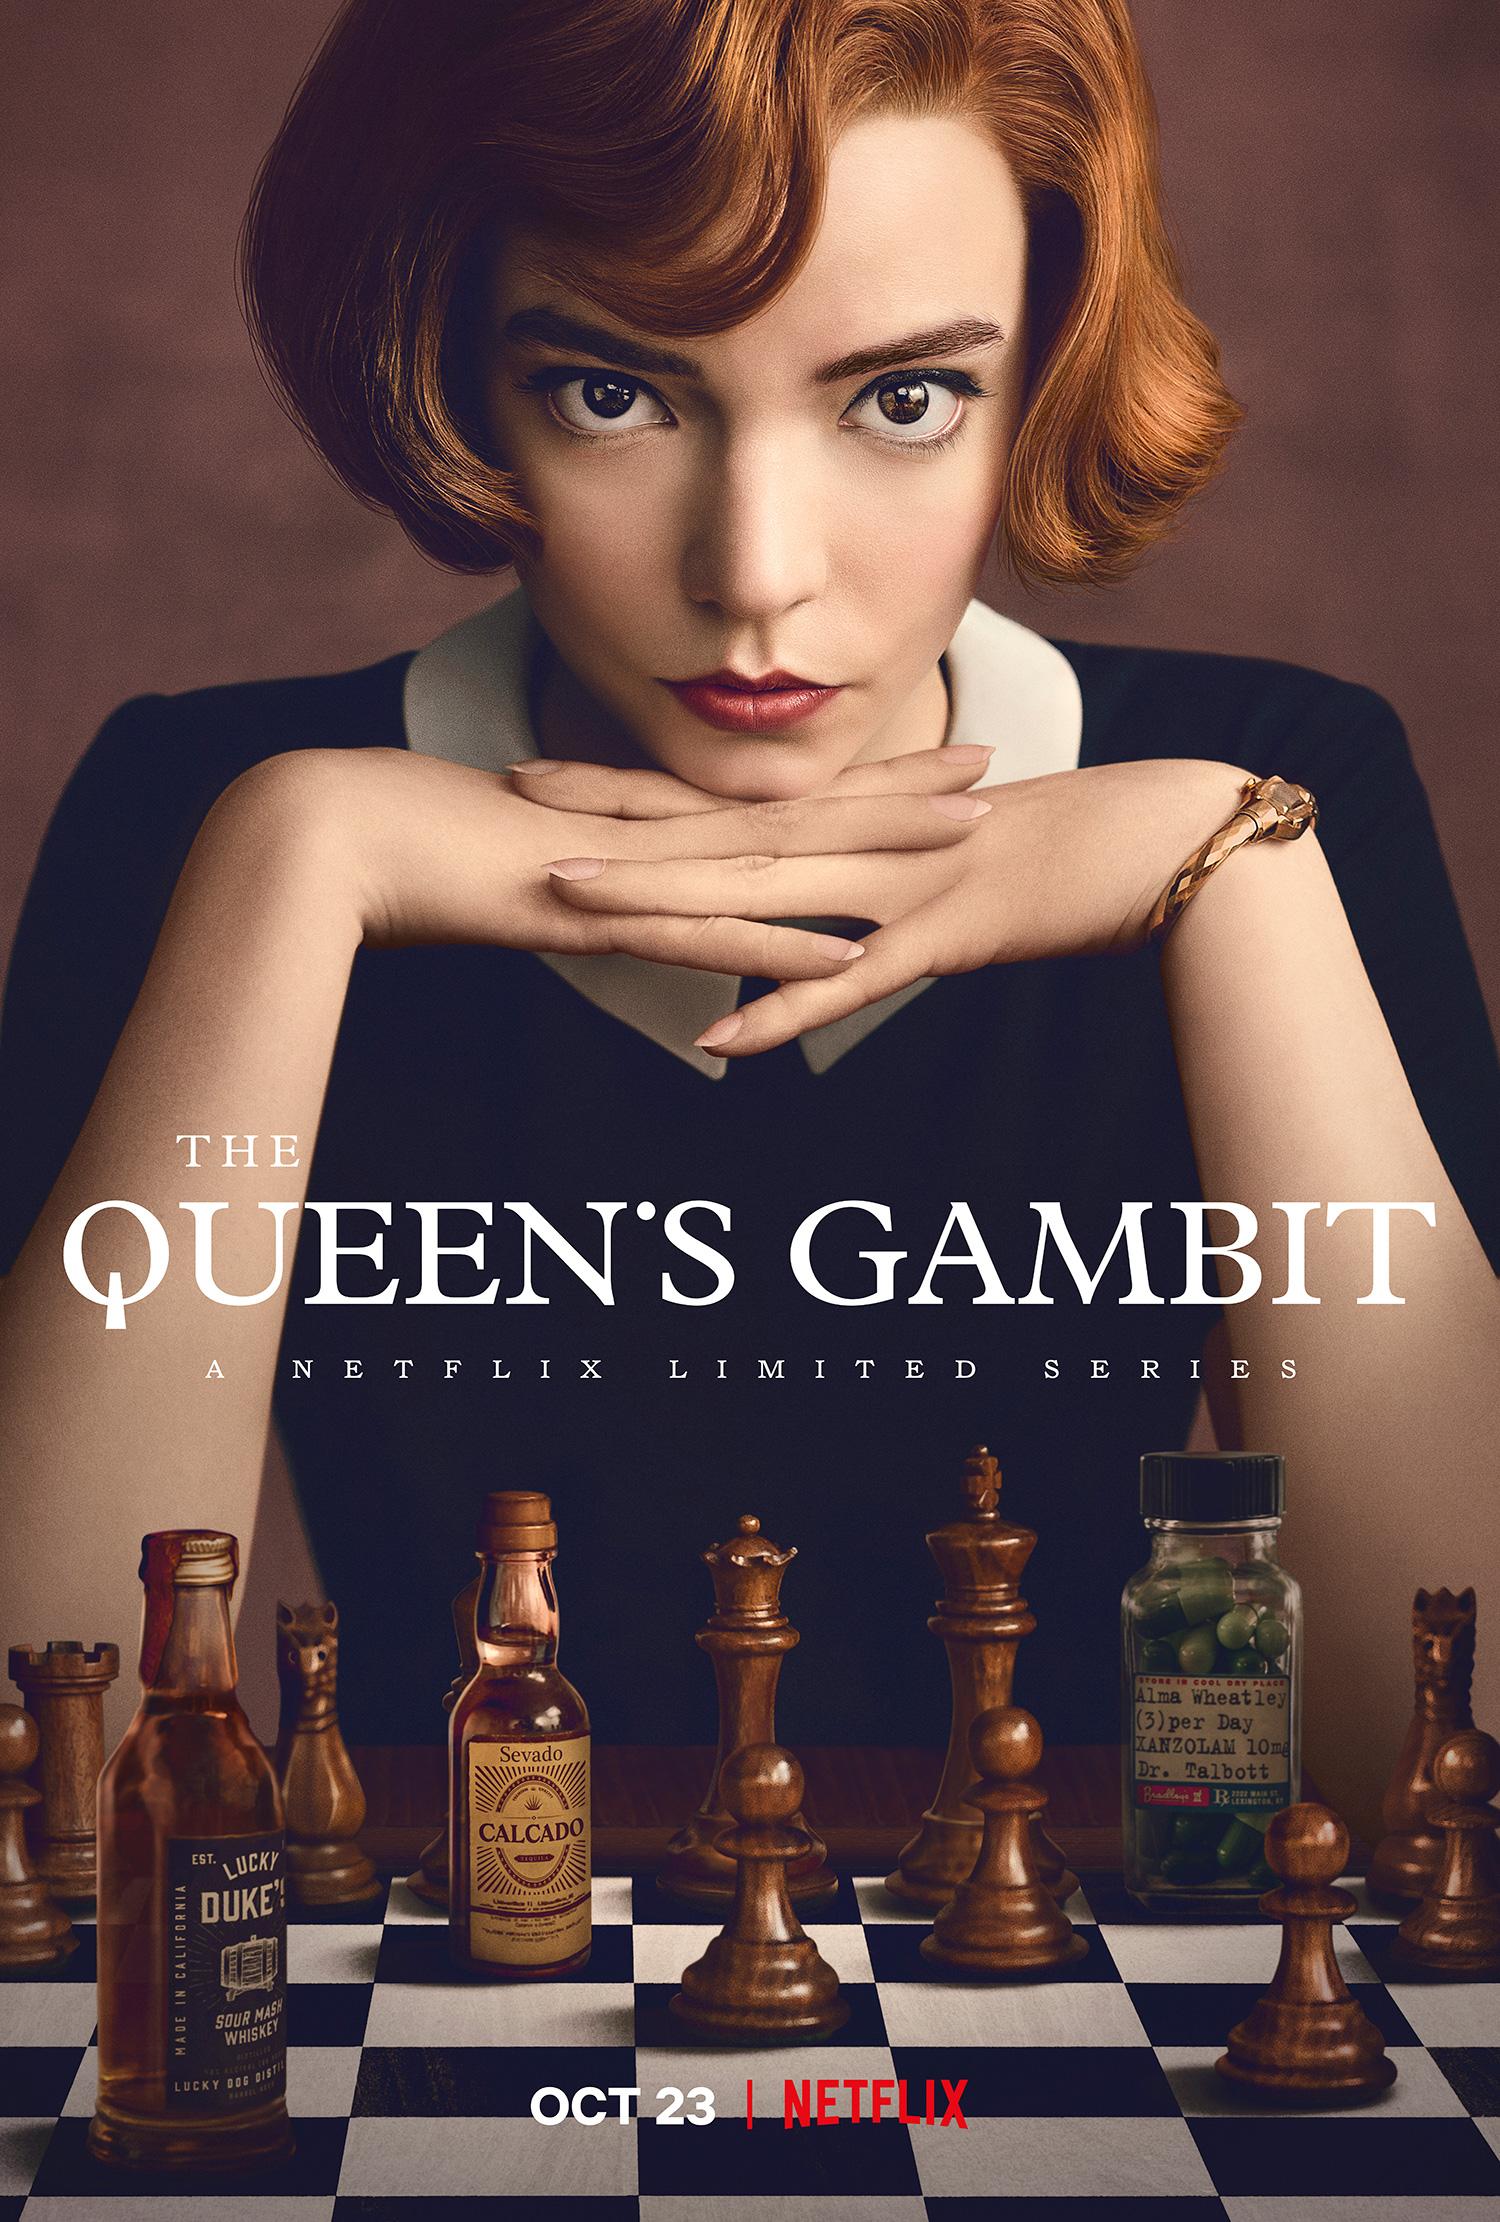 Netflix: The Queen's Gambit (2020) - Movies, Drama & TV Series Lobby - AV Discourse Community Forum (SG)